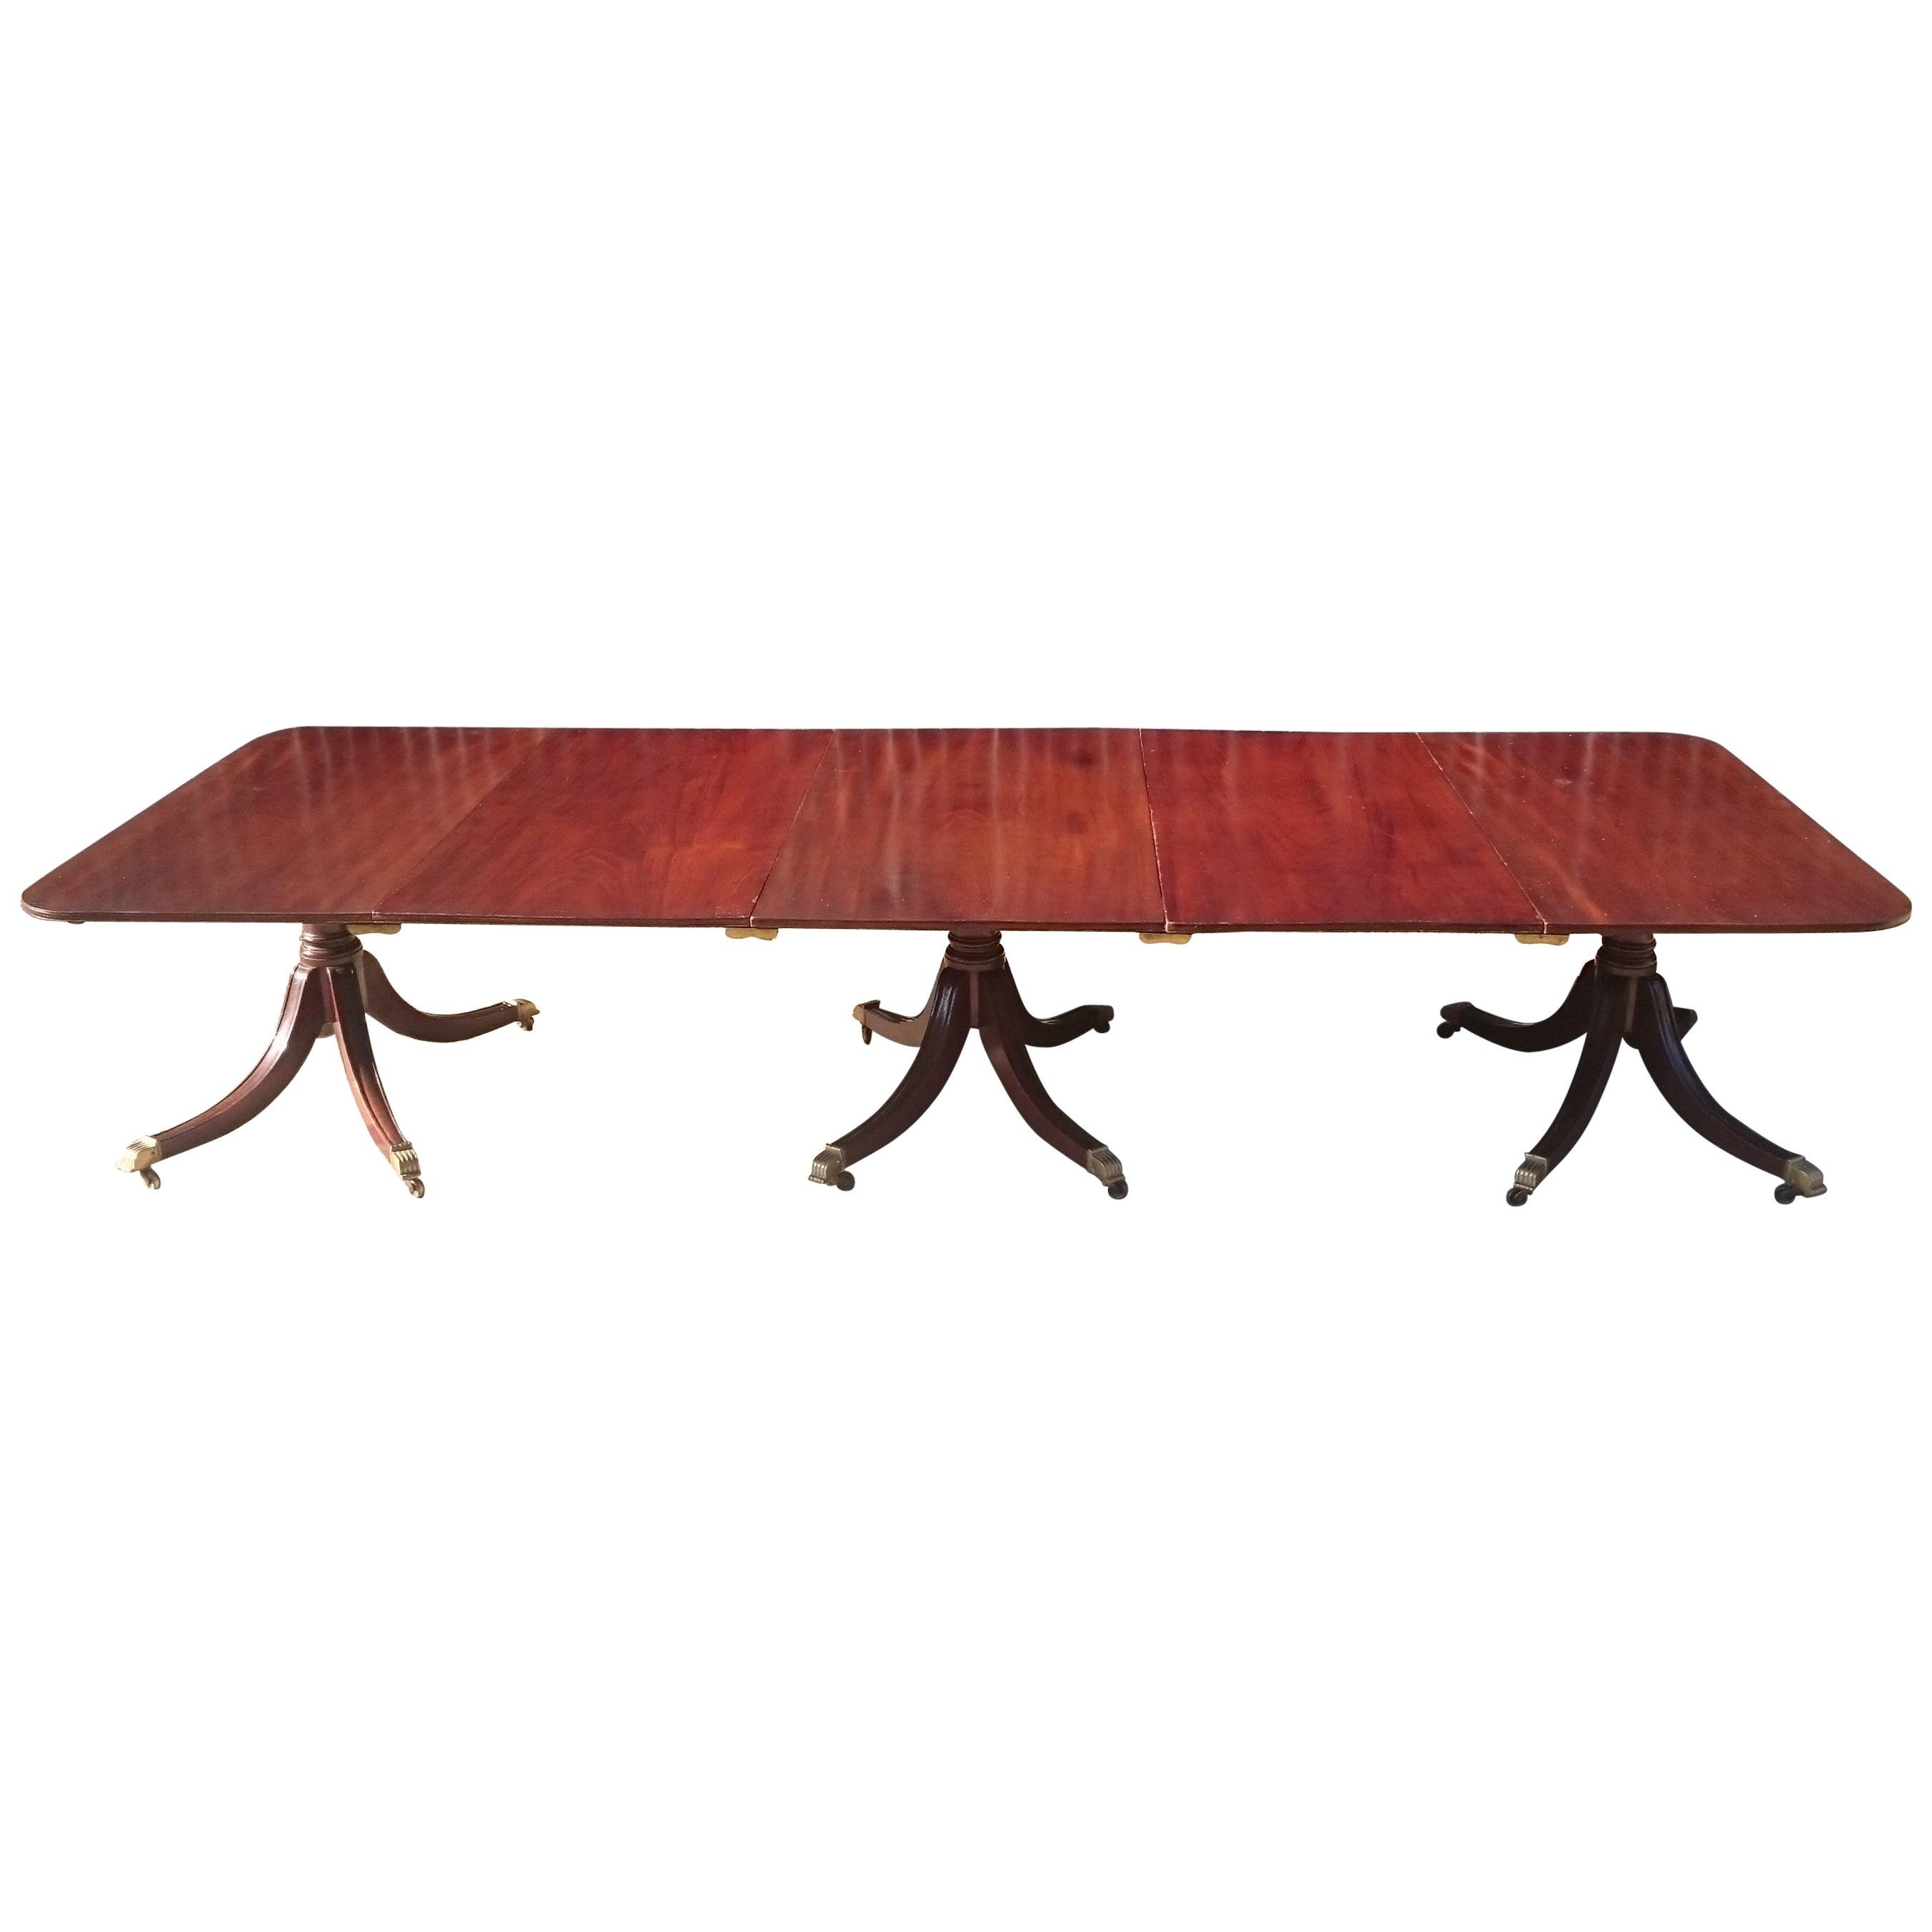 Early 19th Century Georgian Mahogany Three-Pedestal Antique Dining Table